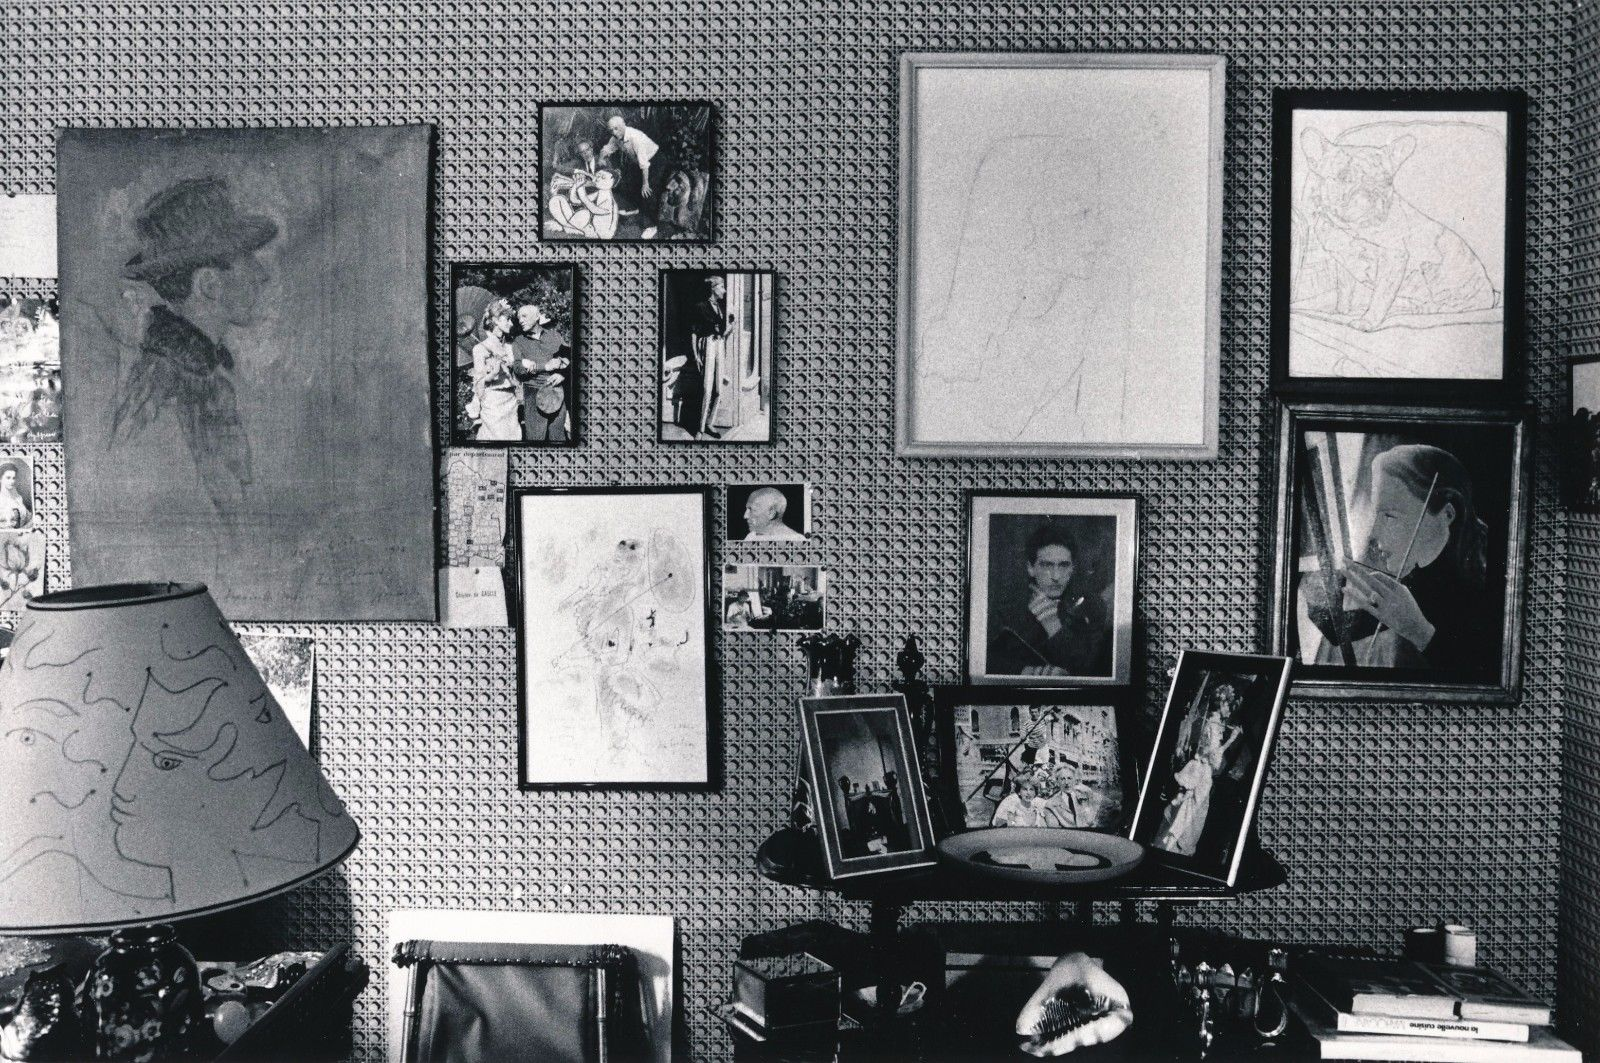 Intérieur de Francine Weisweiller, photographie